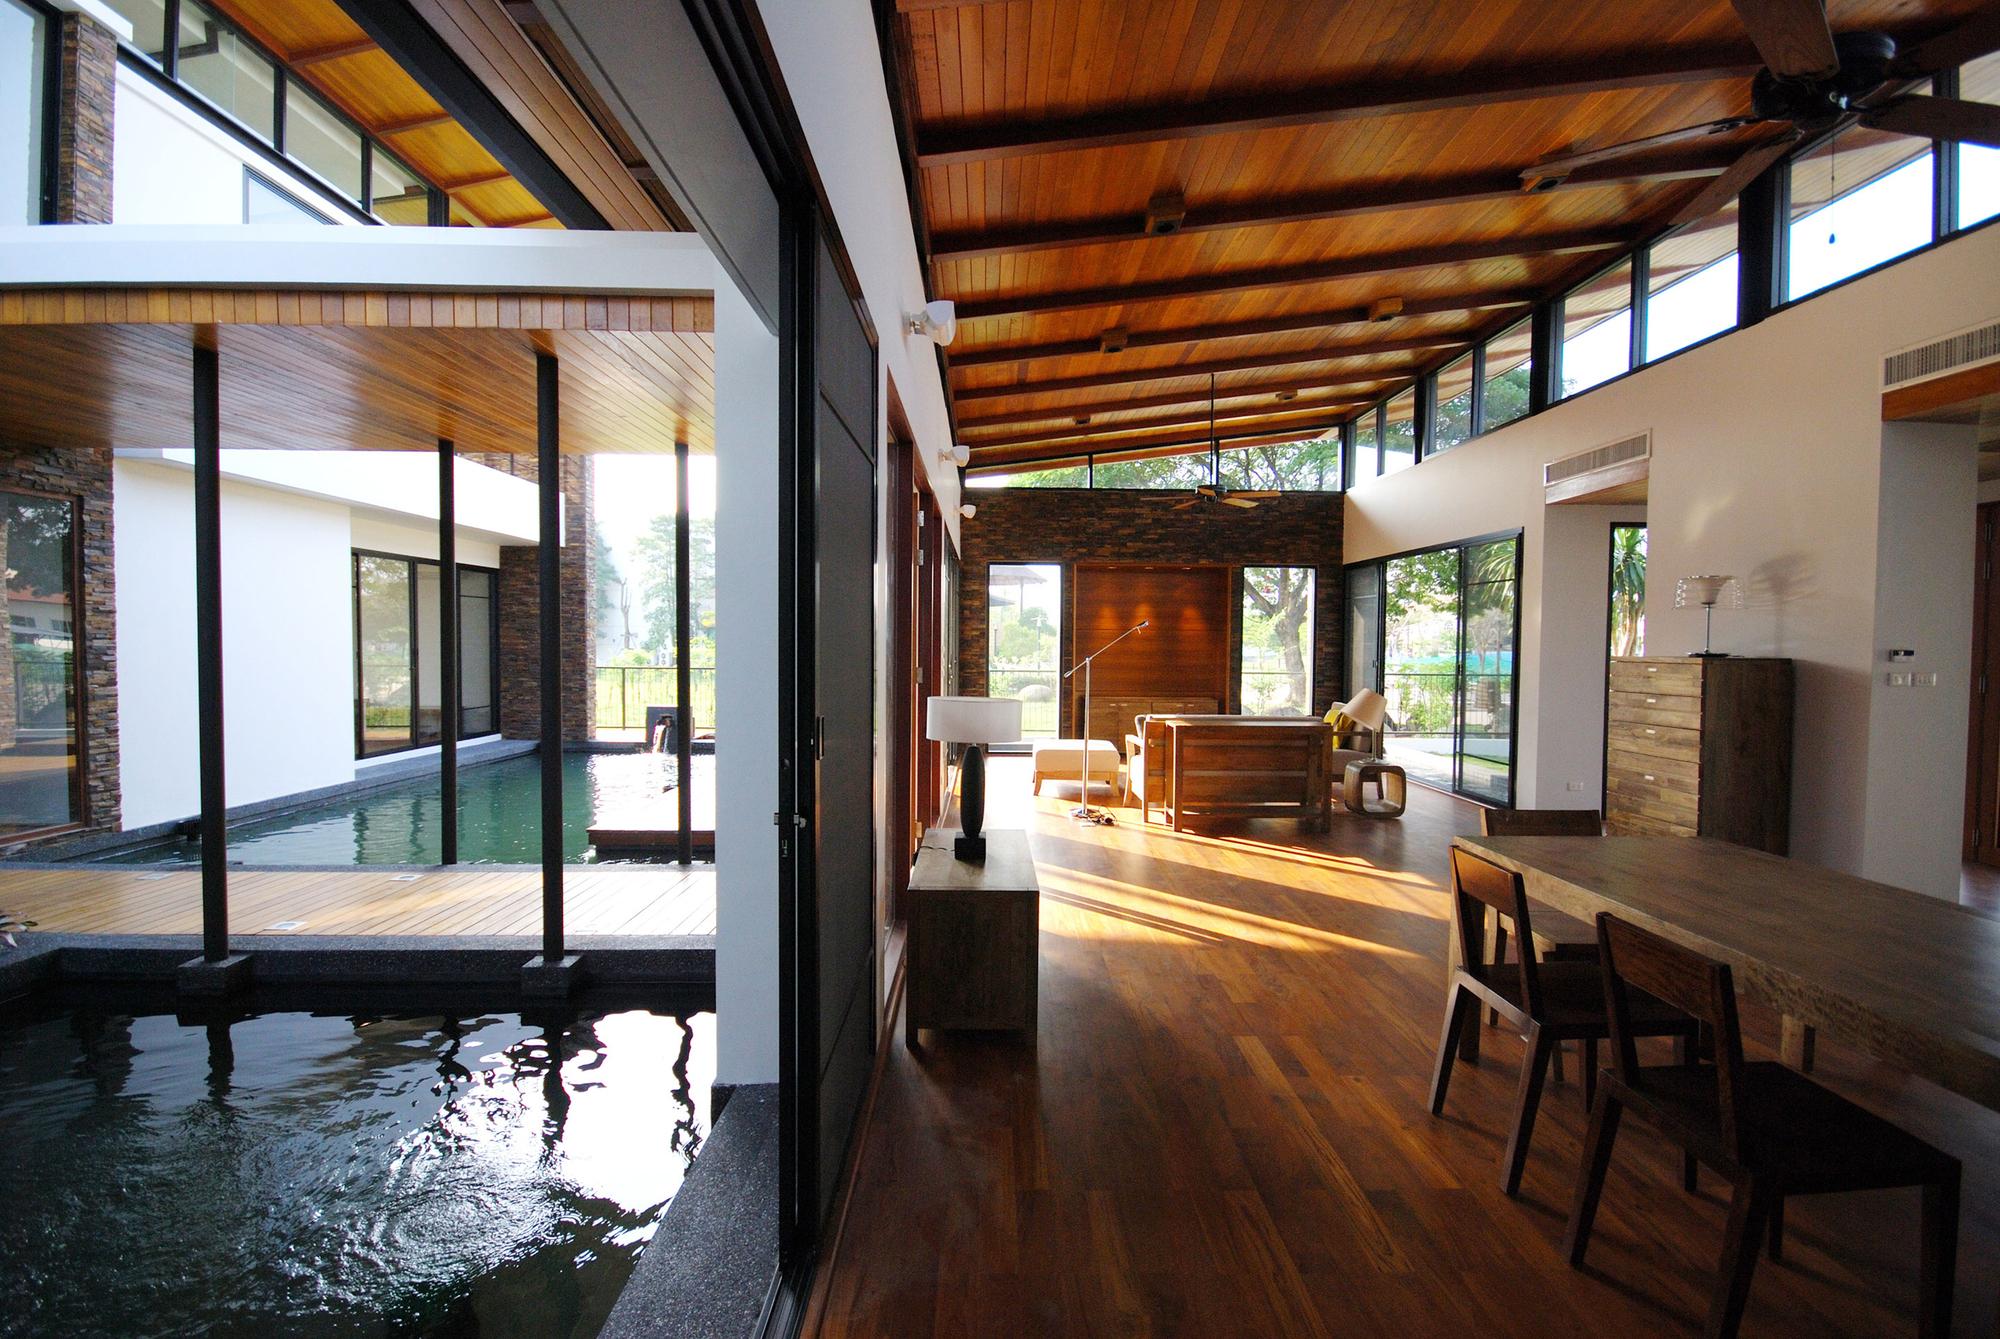 Nature House Junsekino Architect And Design - 2